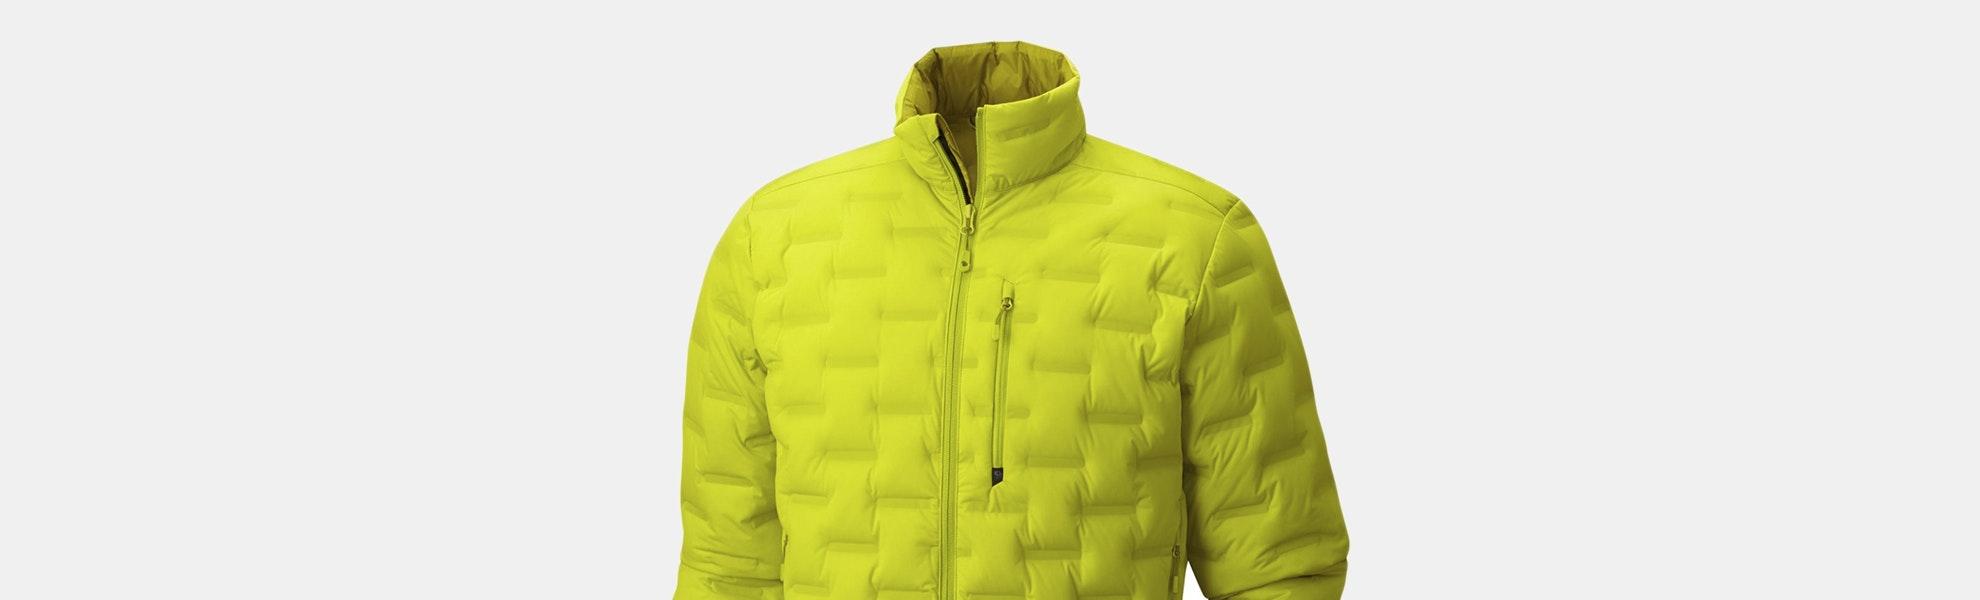 Mountain Hardwear Men's StretchDown DS Jackets